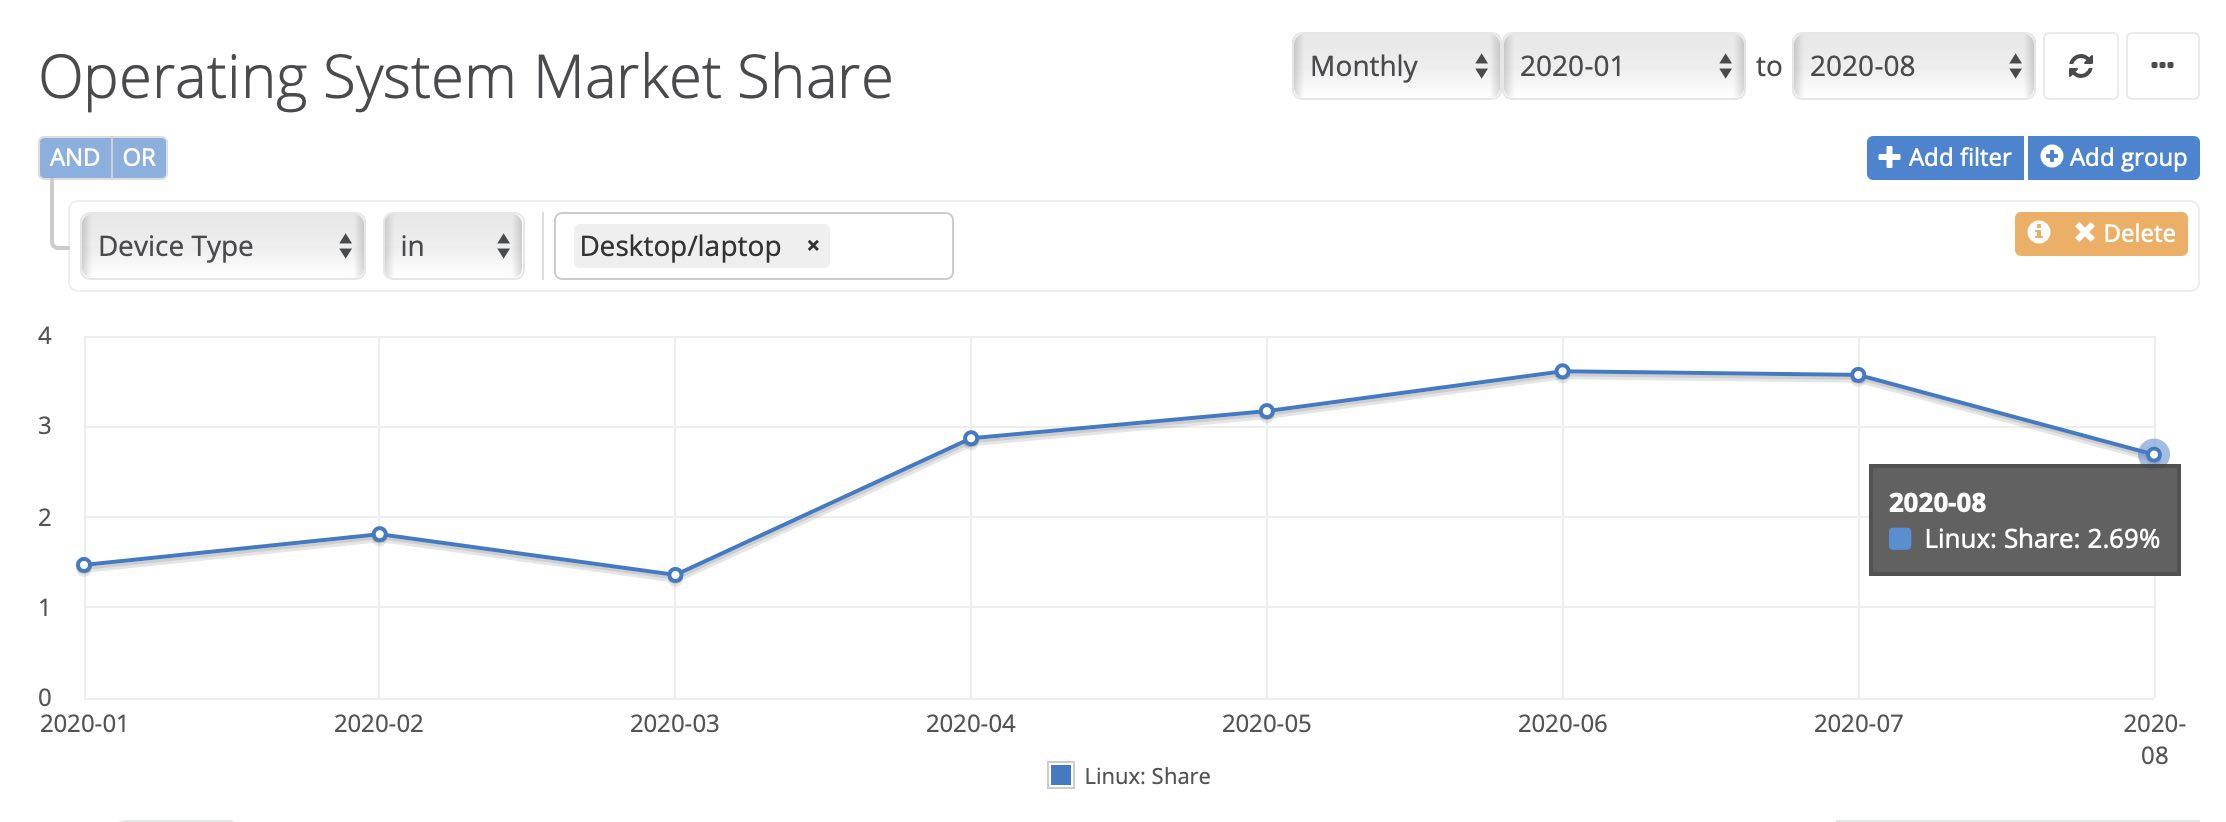 netmarketshare graph